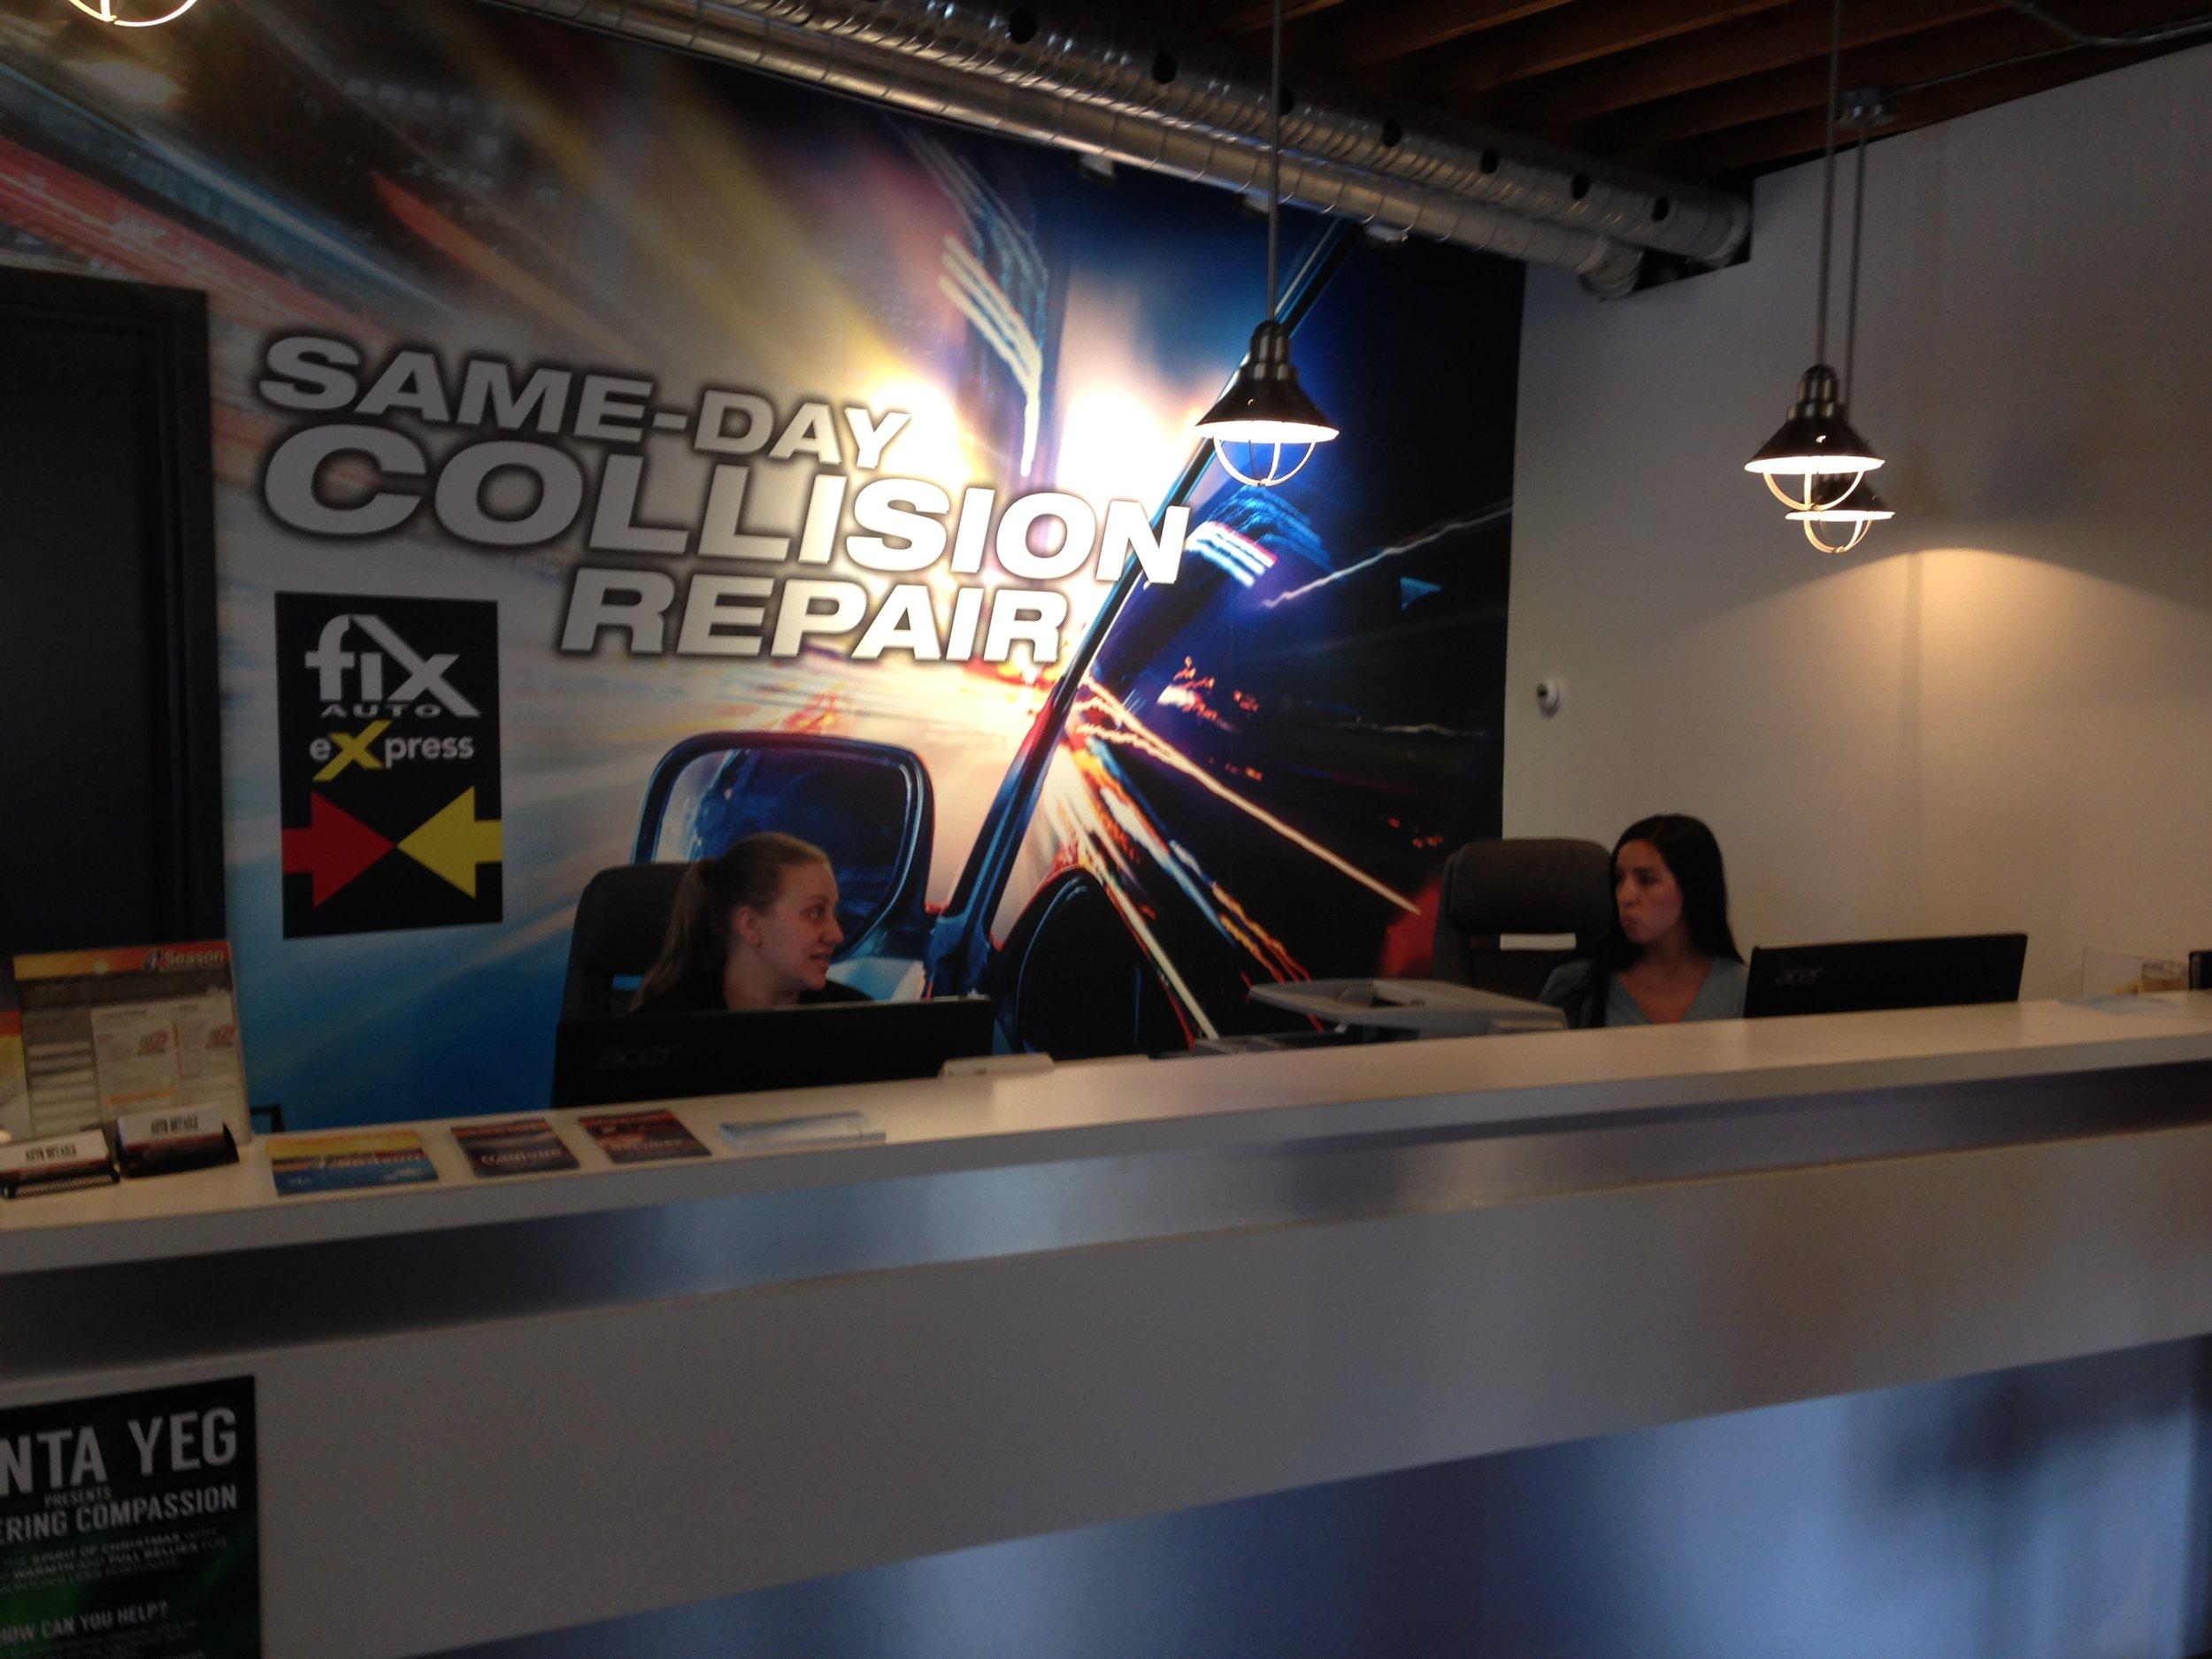 Fix Auto Express Edmonton Reception 2.JPG